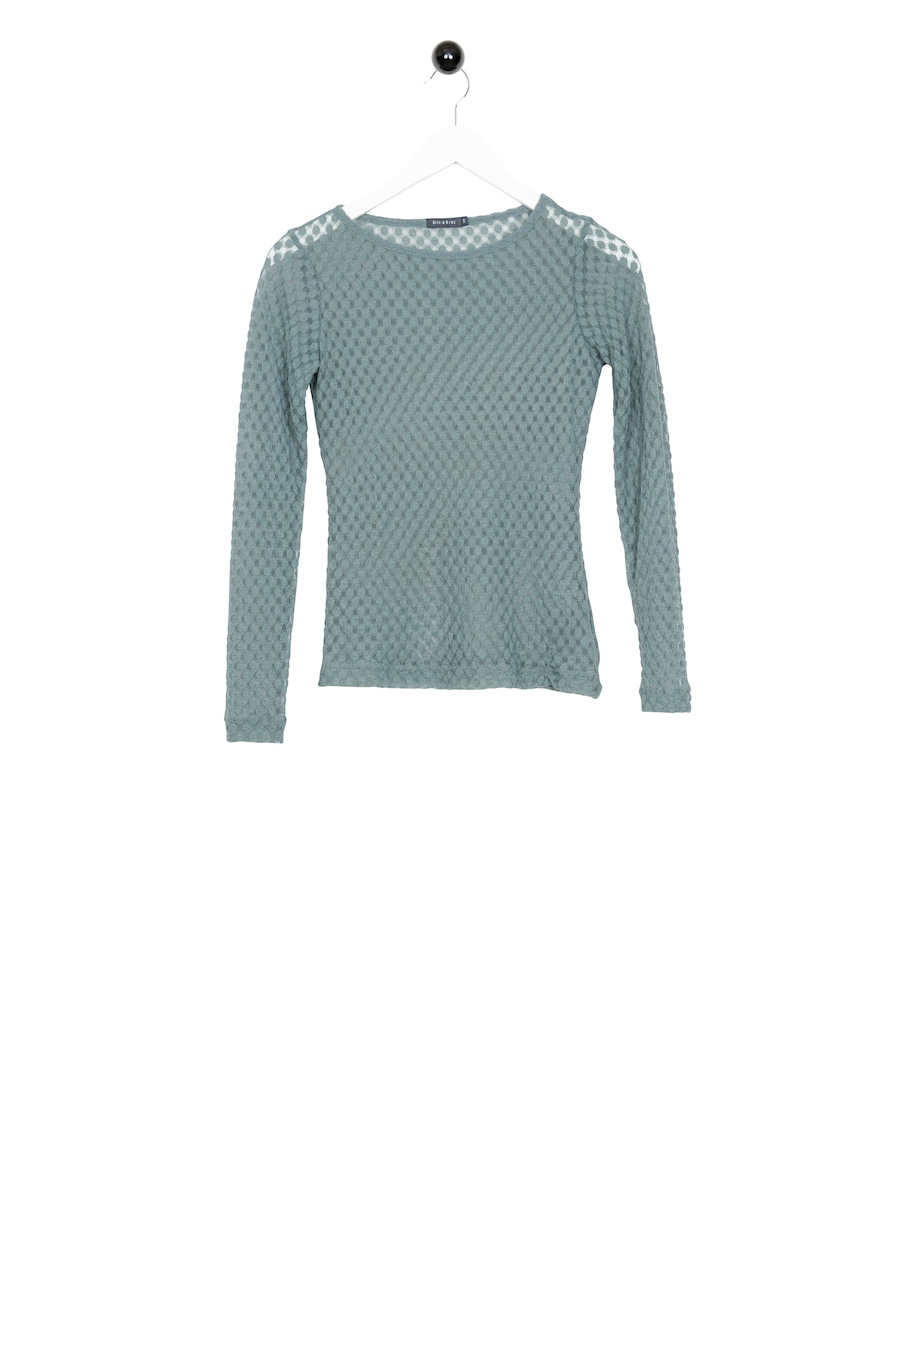 Vide Sweater